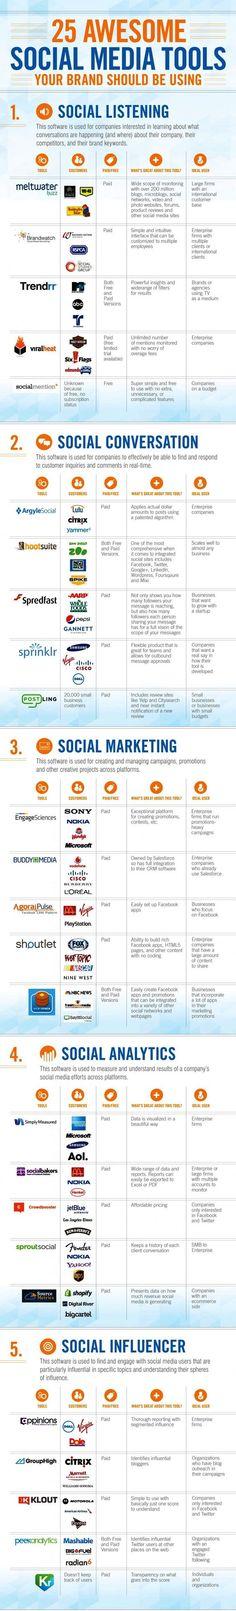 25 awesome social media tools. #socialmedia #marketing #infographic: